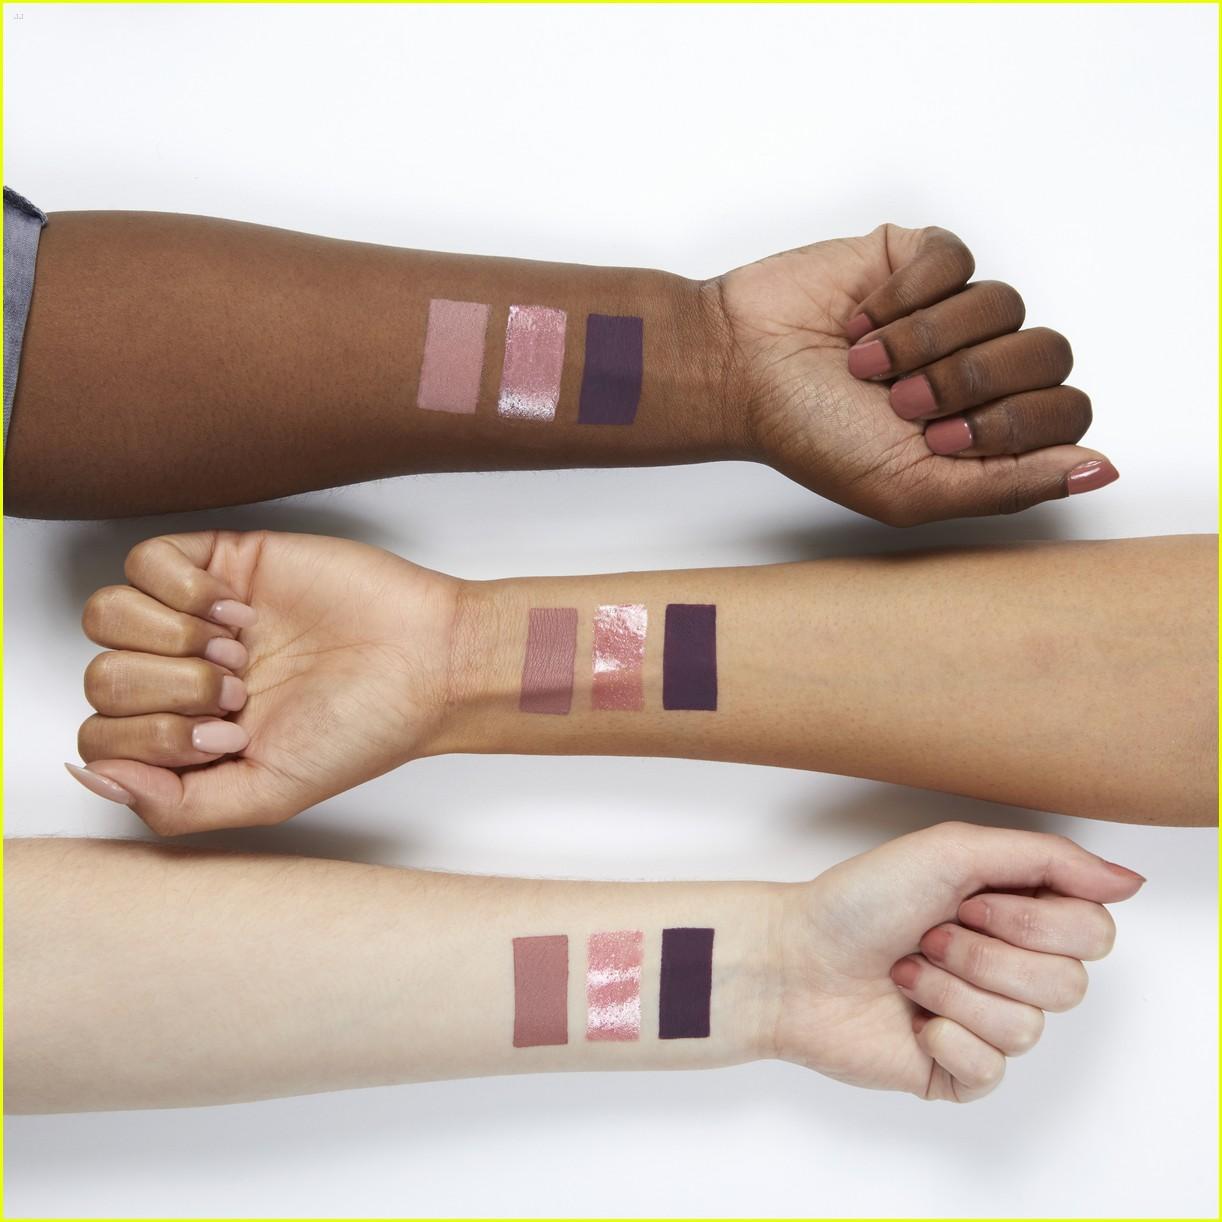 amanda steele collabs colourpop cosmetics collection 09